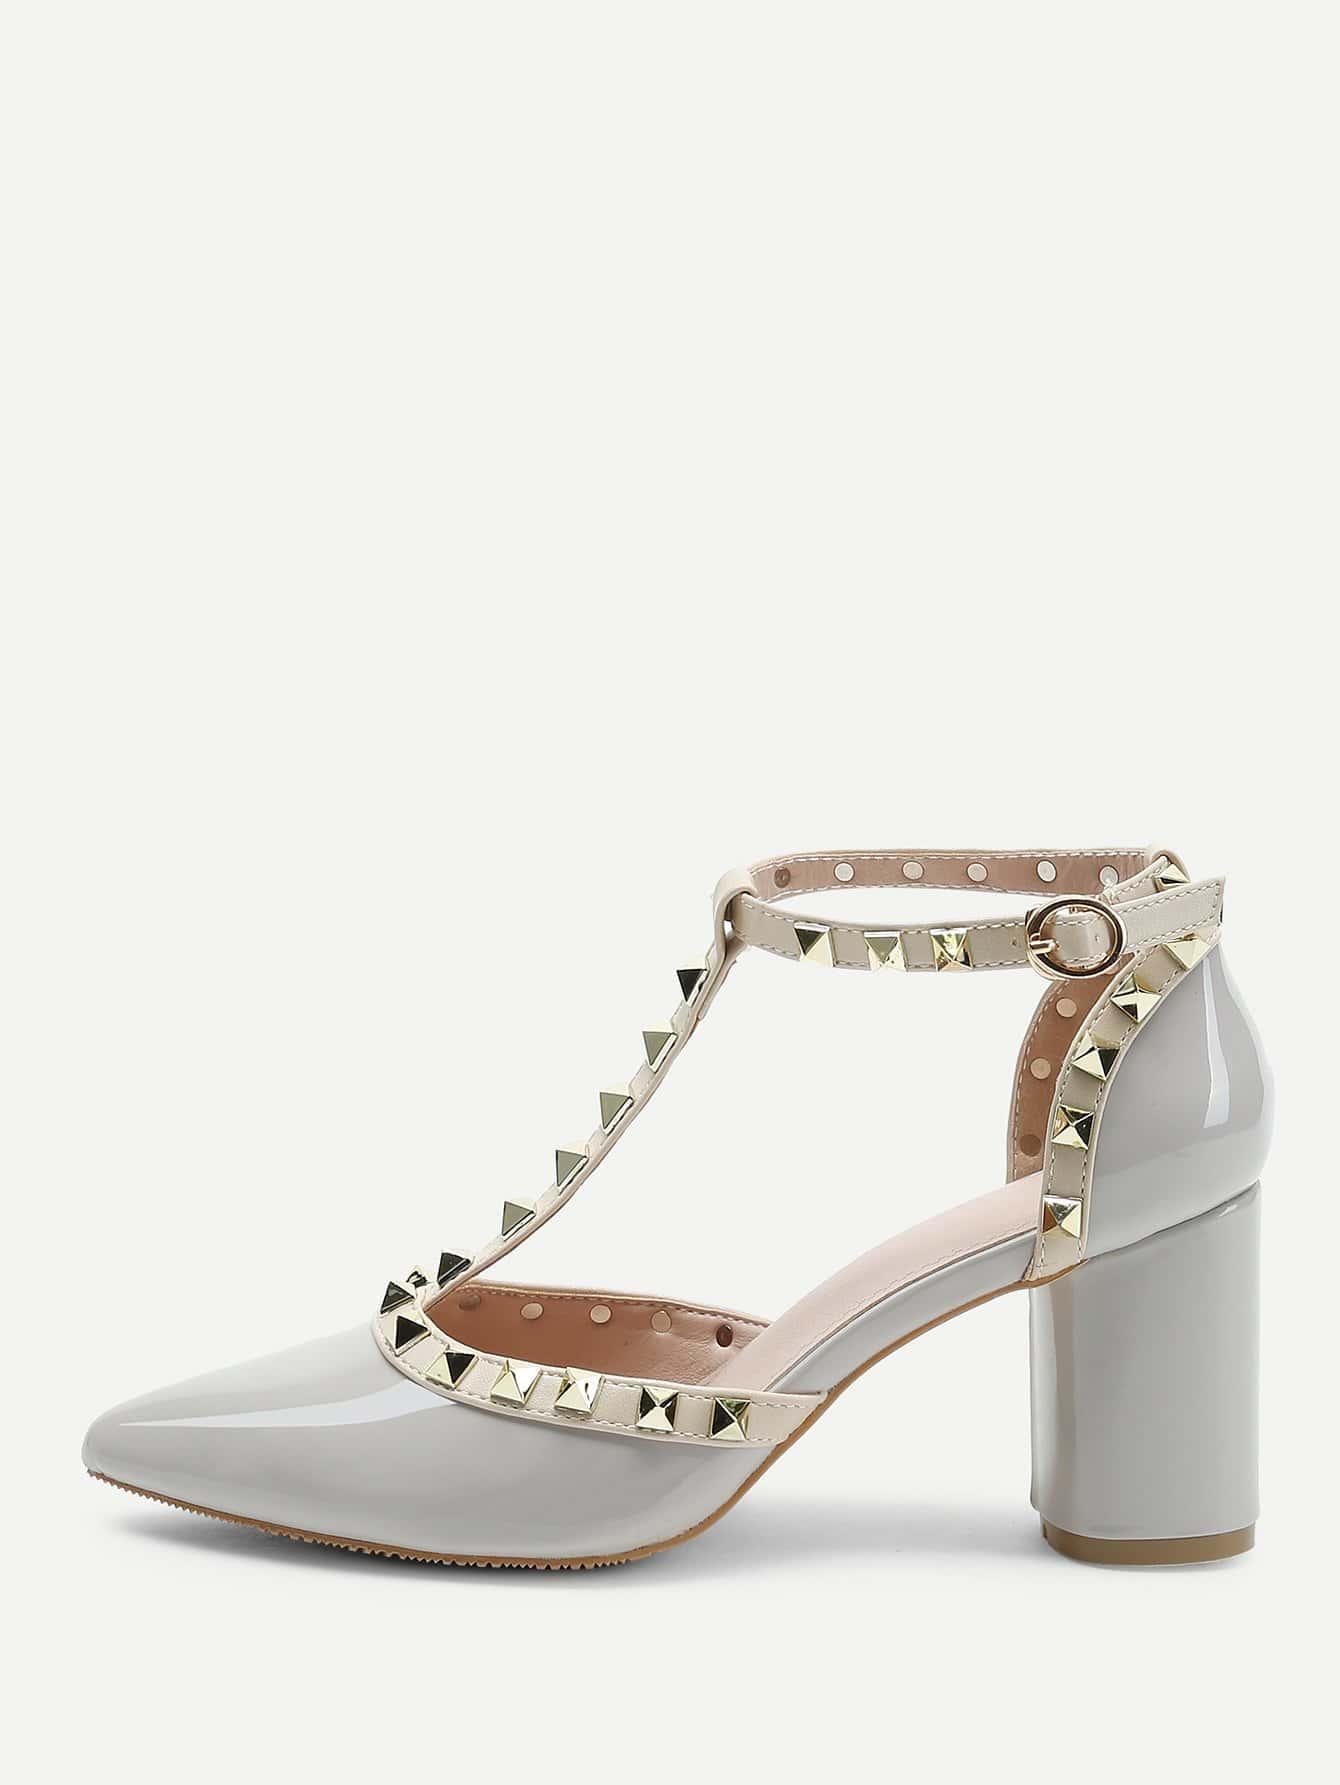 Rivet Detail T-strap Chunky Heels rivet detail gladiator chunky heels